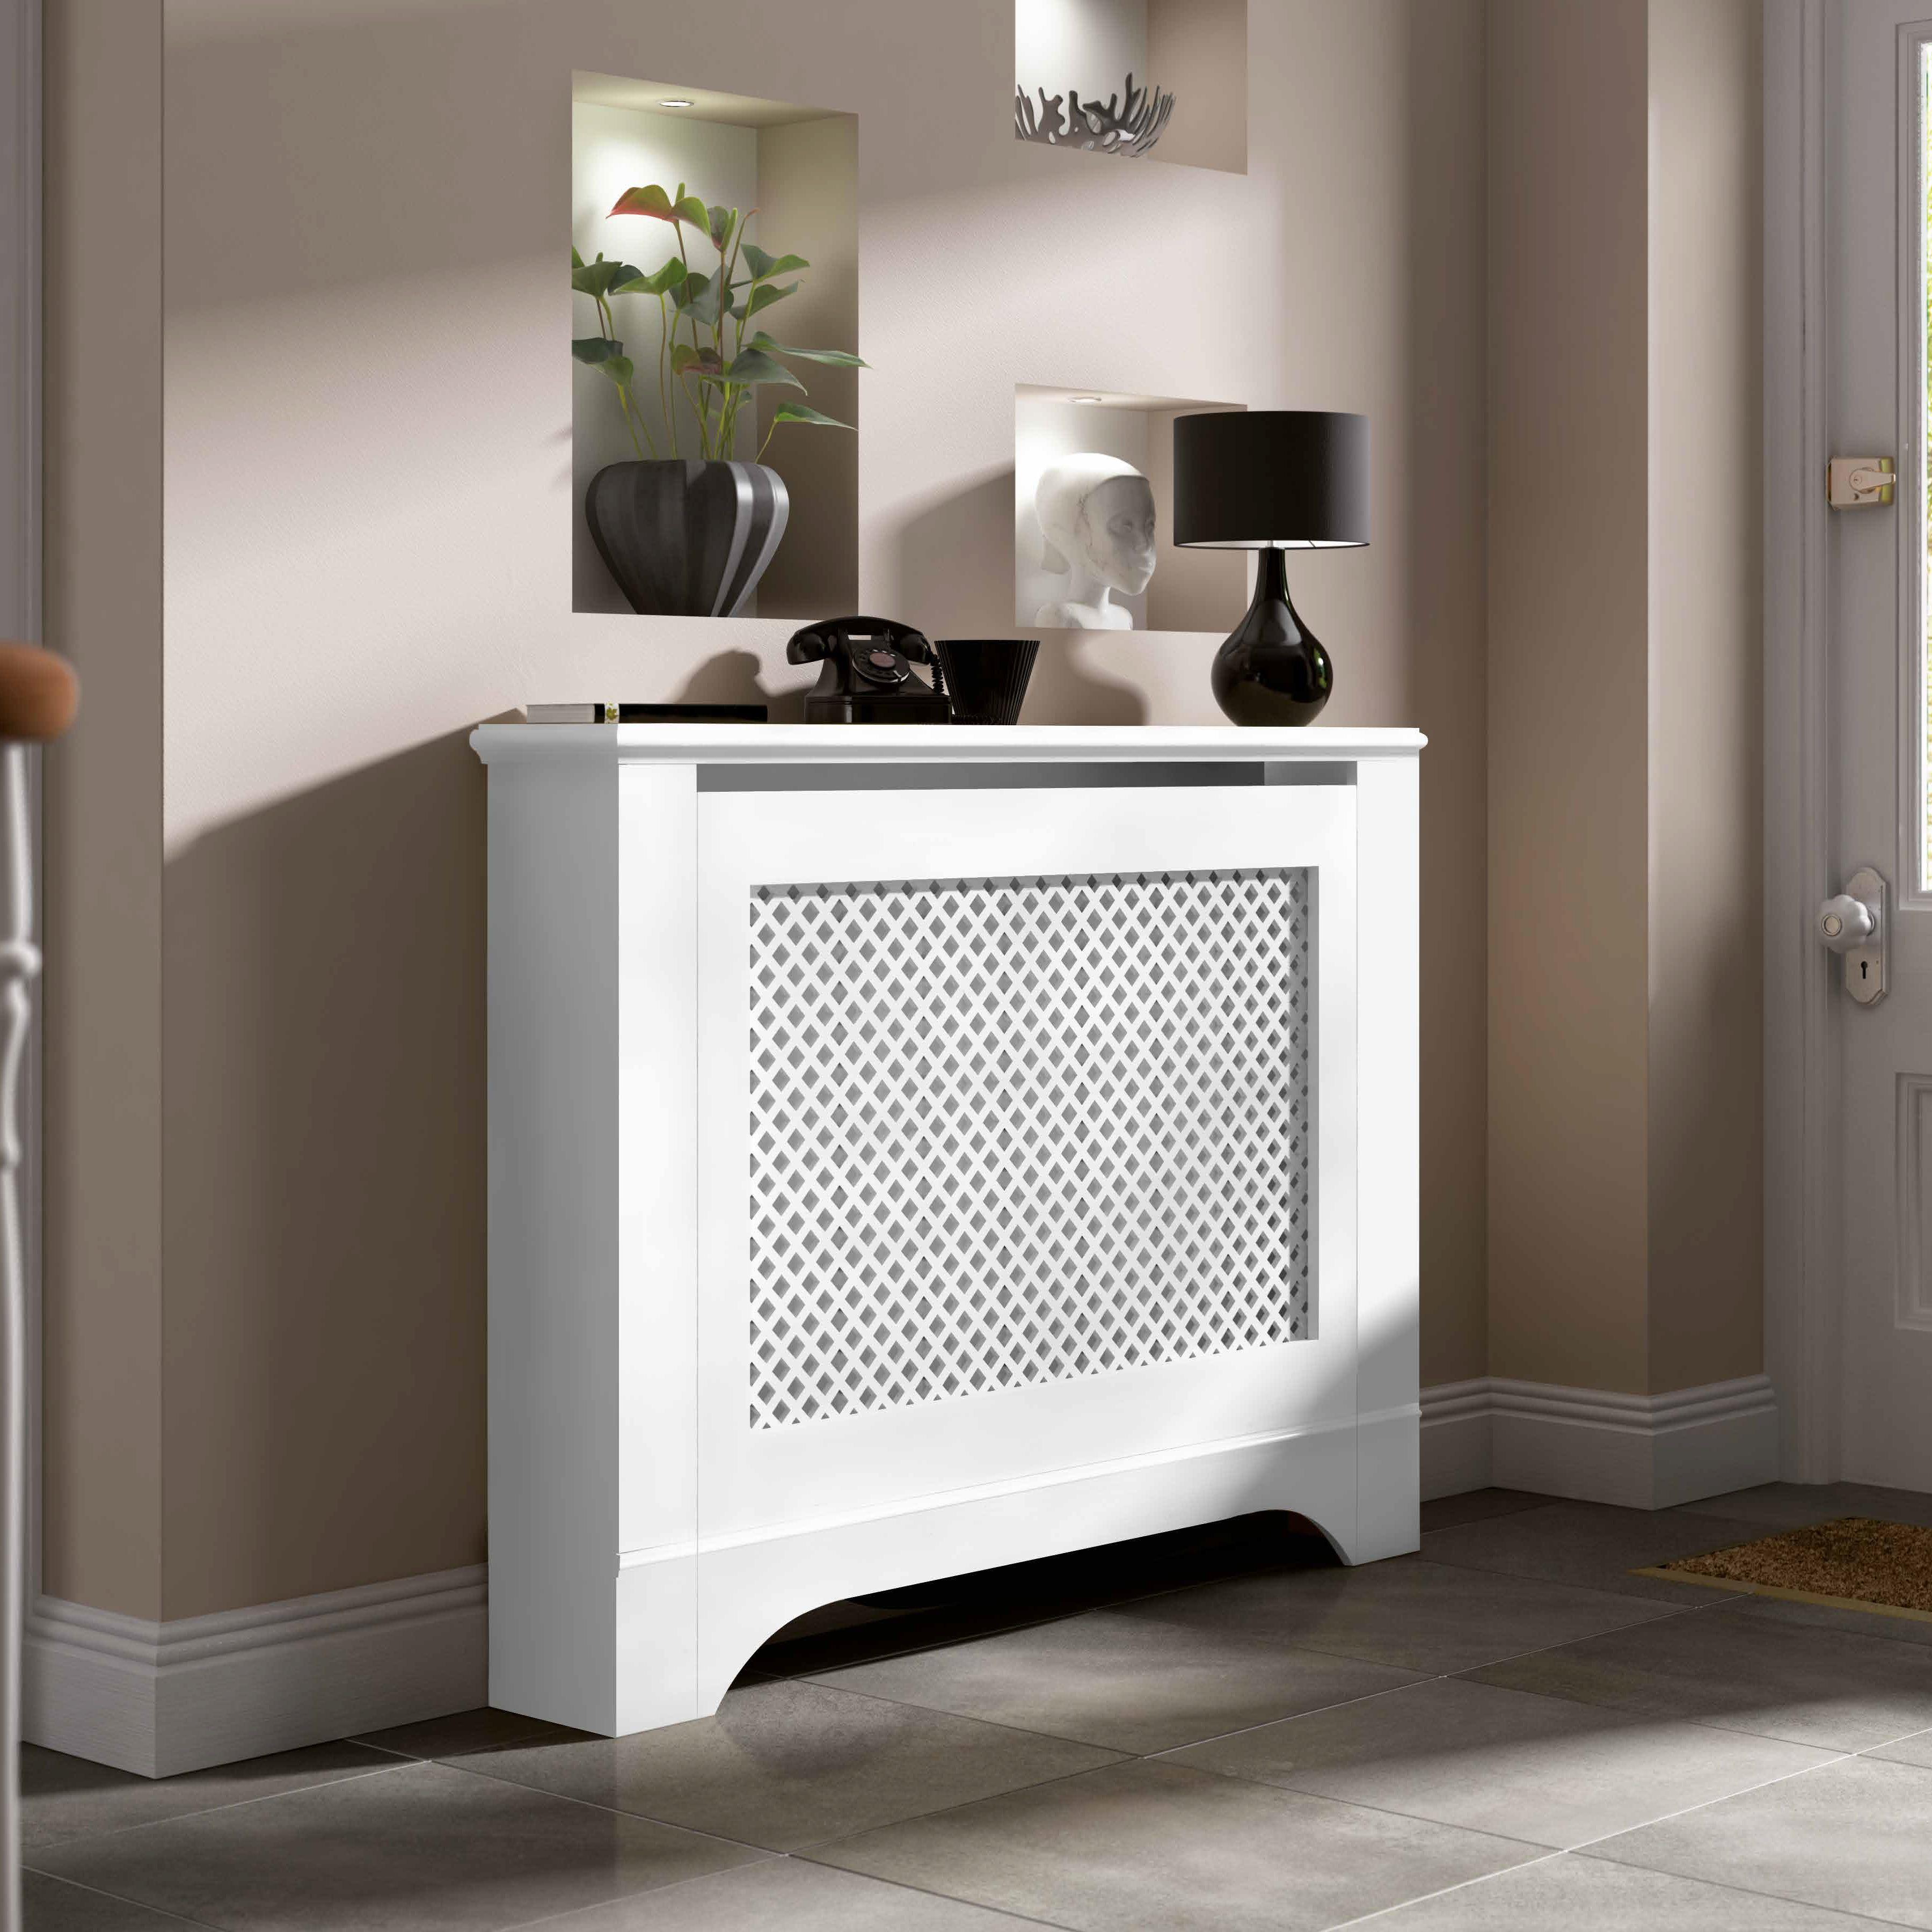 Mayfair Medium White Painted Radiator Cover Departments Diy At B Q